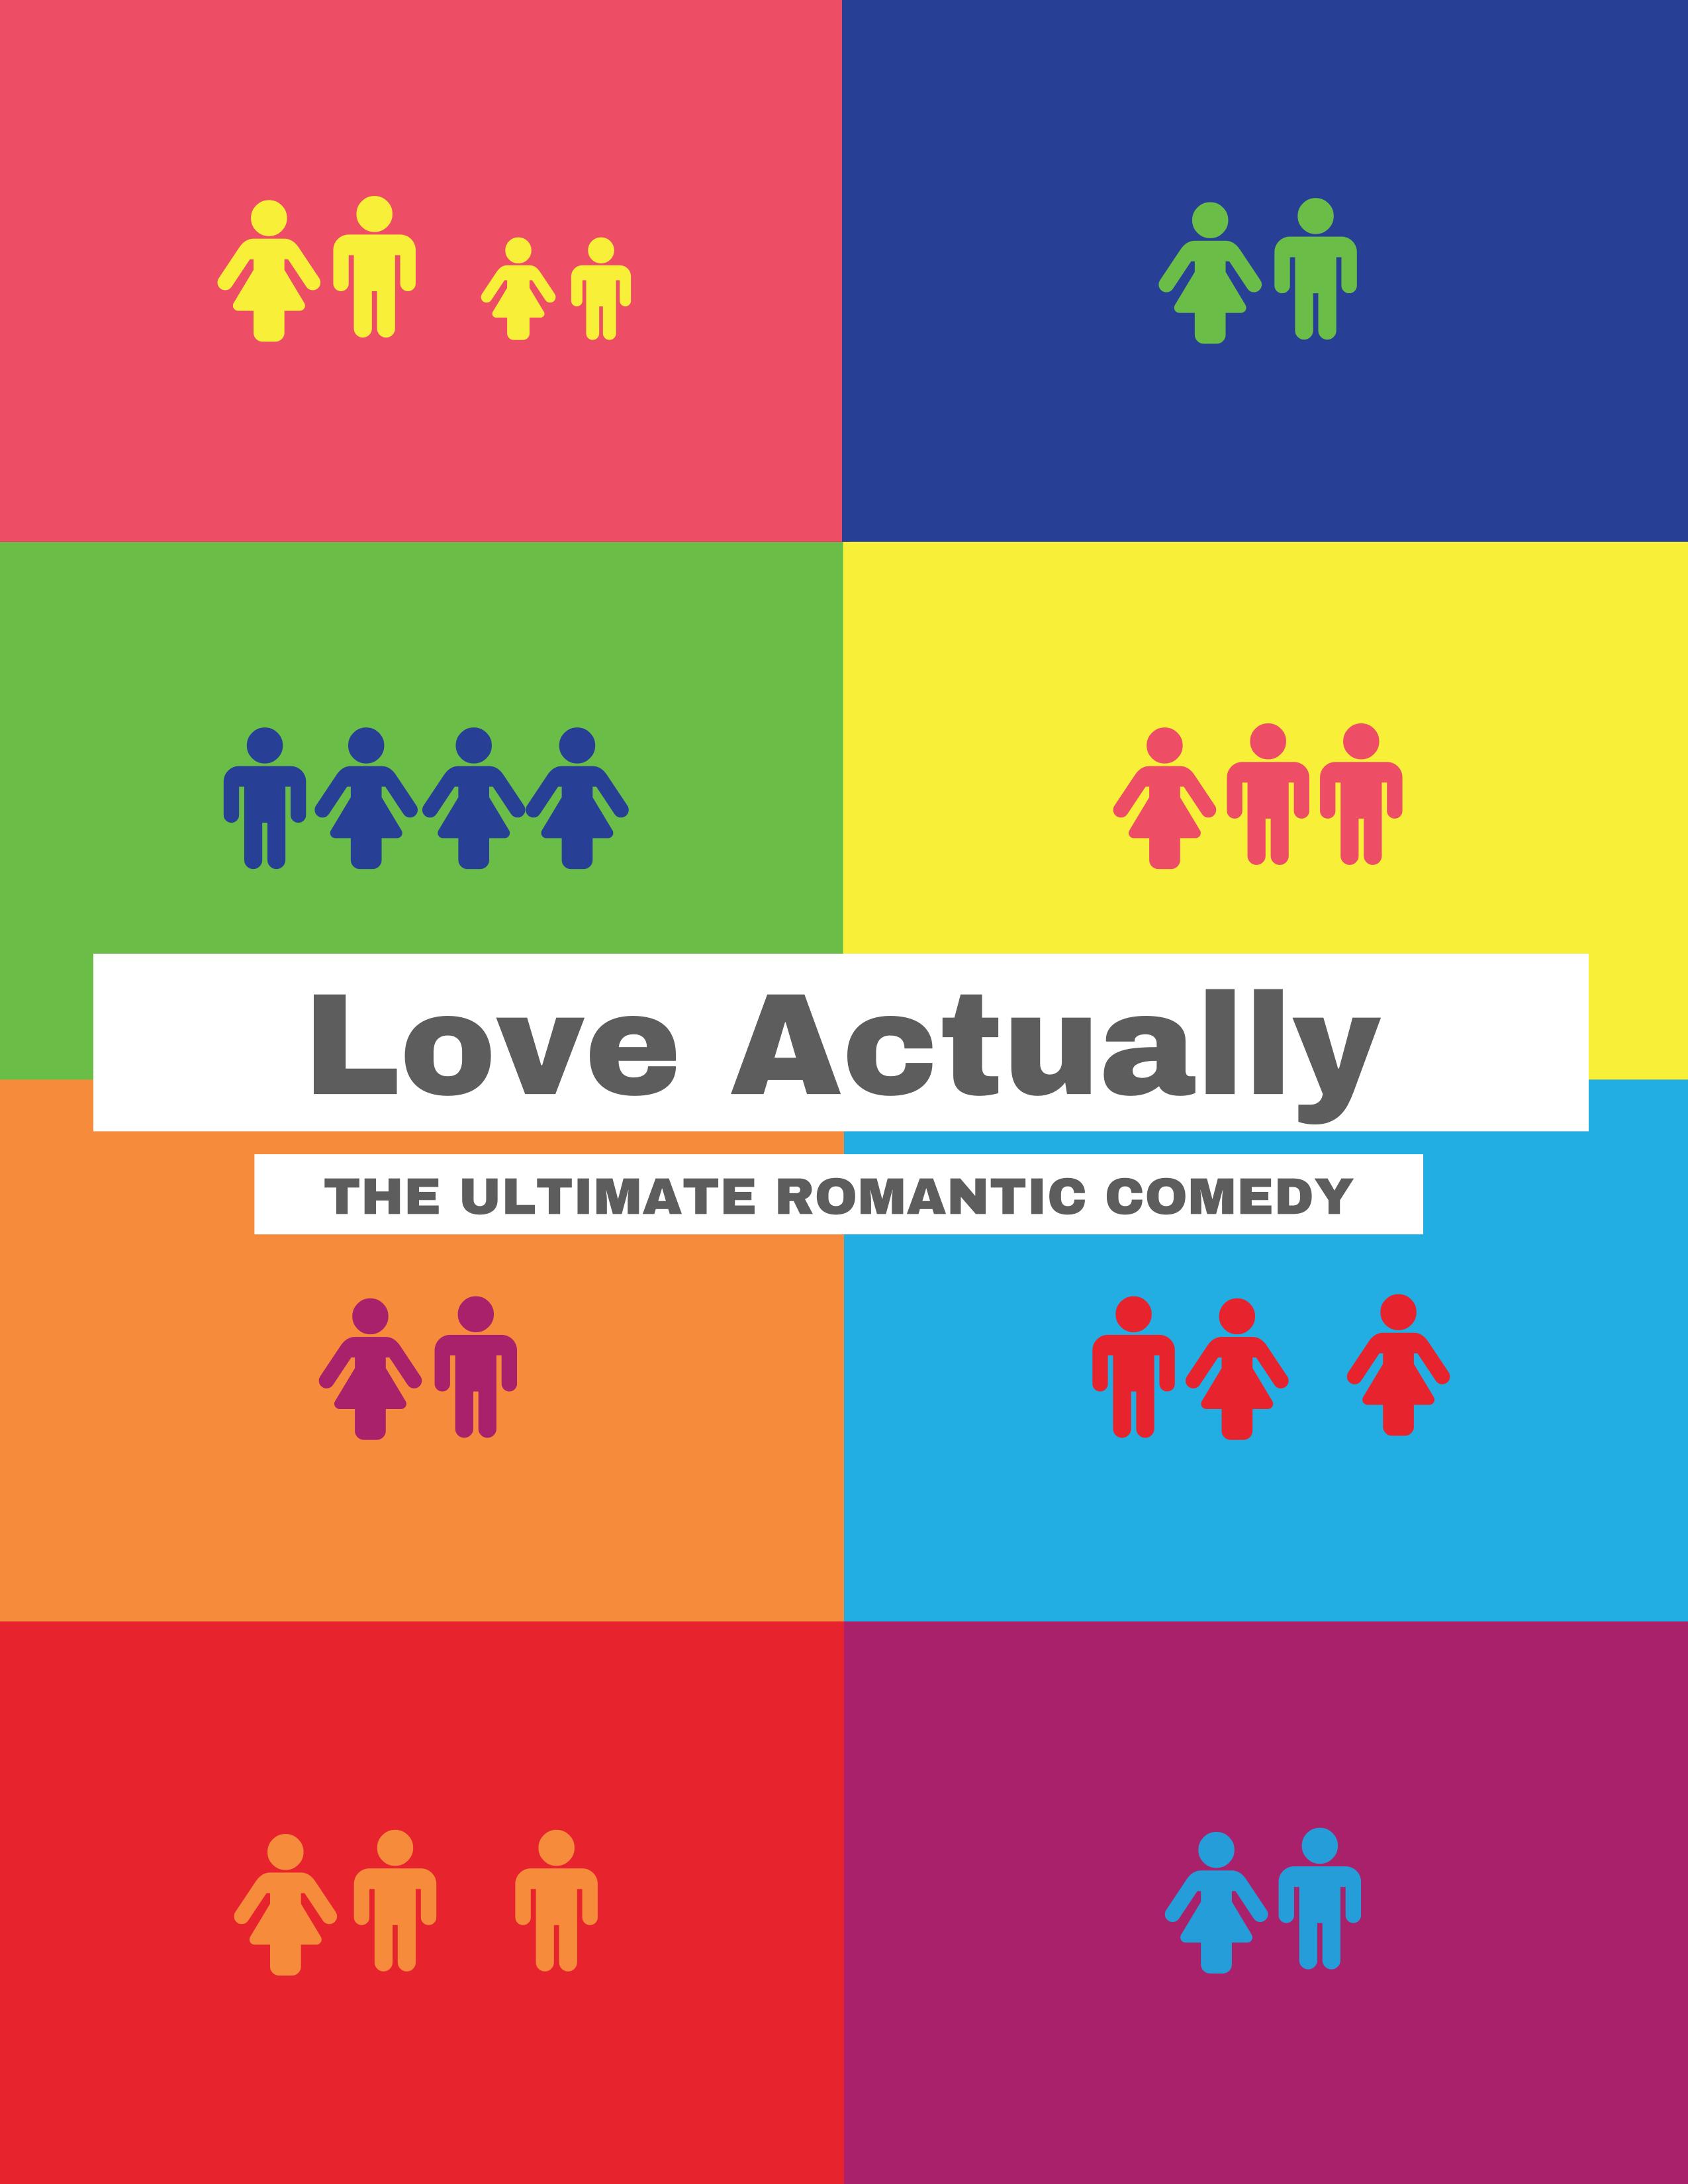 Love Actually Modern Movie Poster Idea